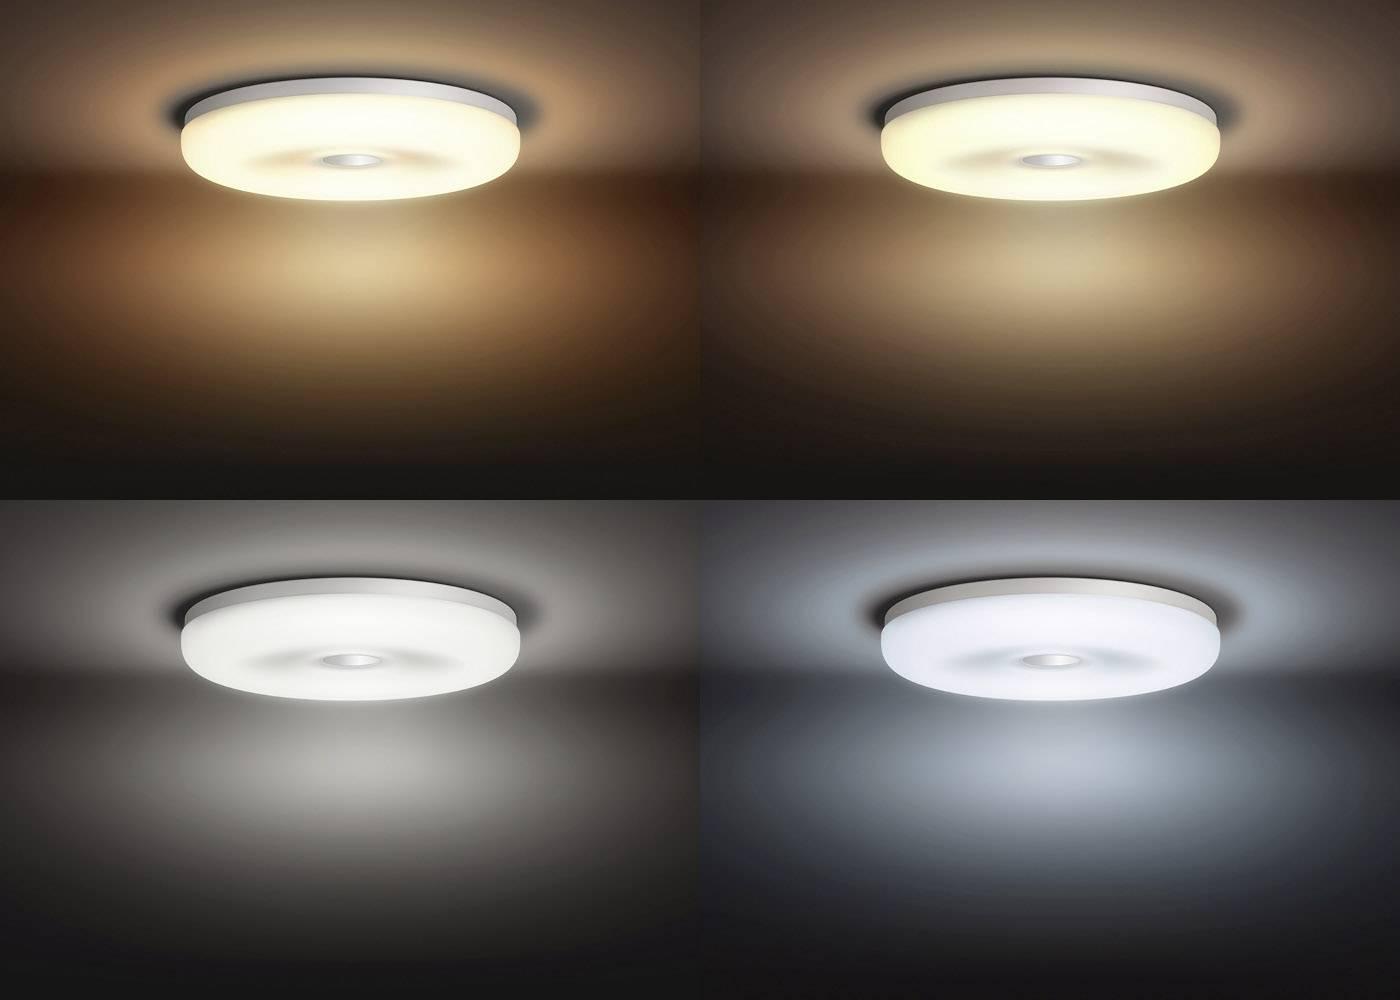 Philips lighting hue led plafondlamp voor badkamers struana led